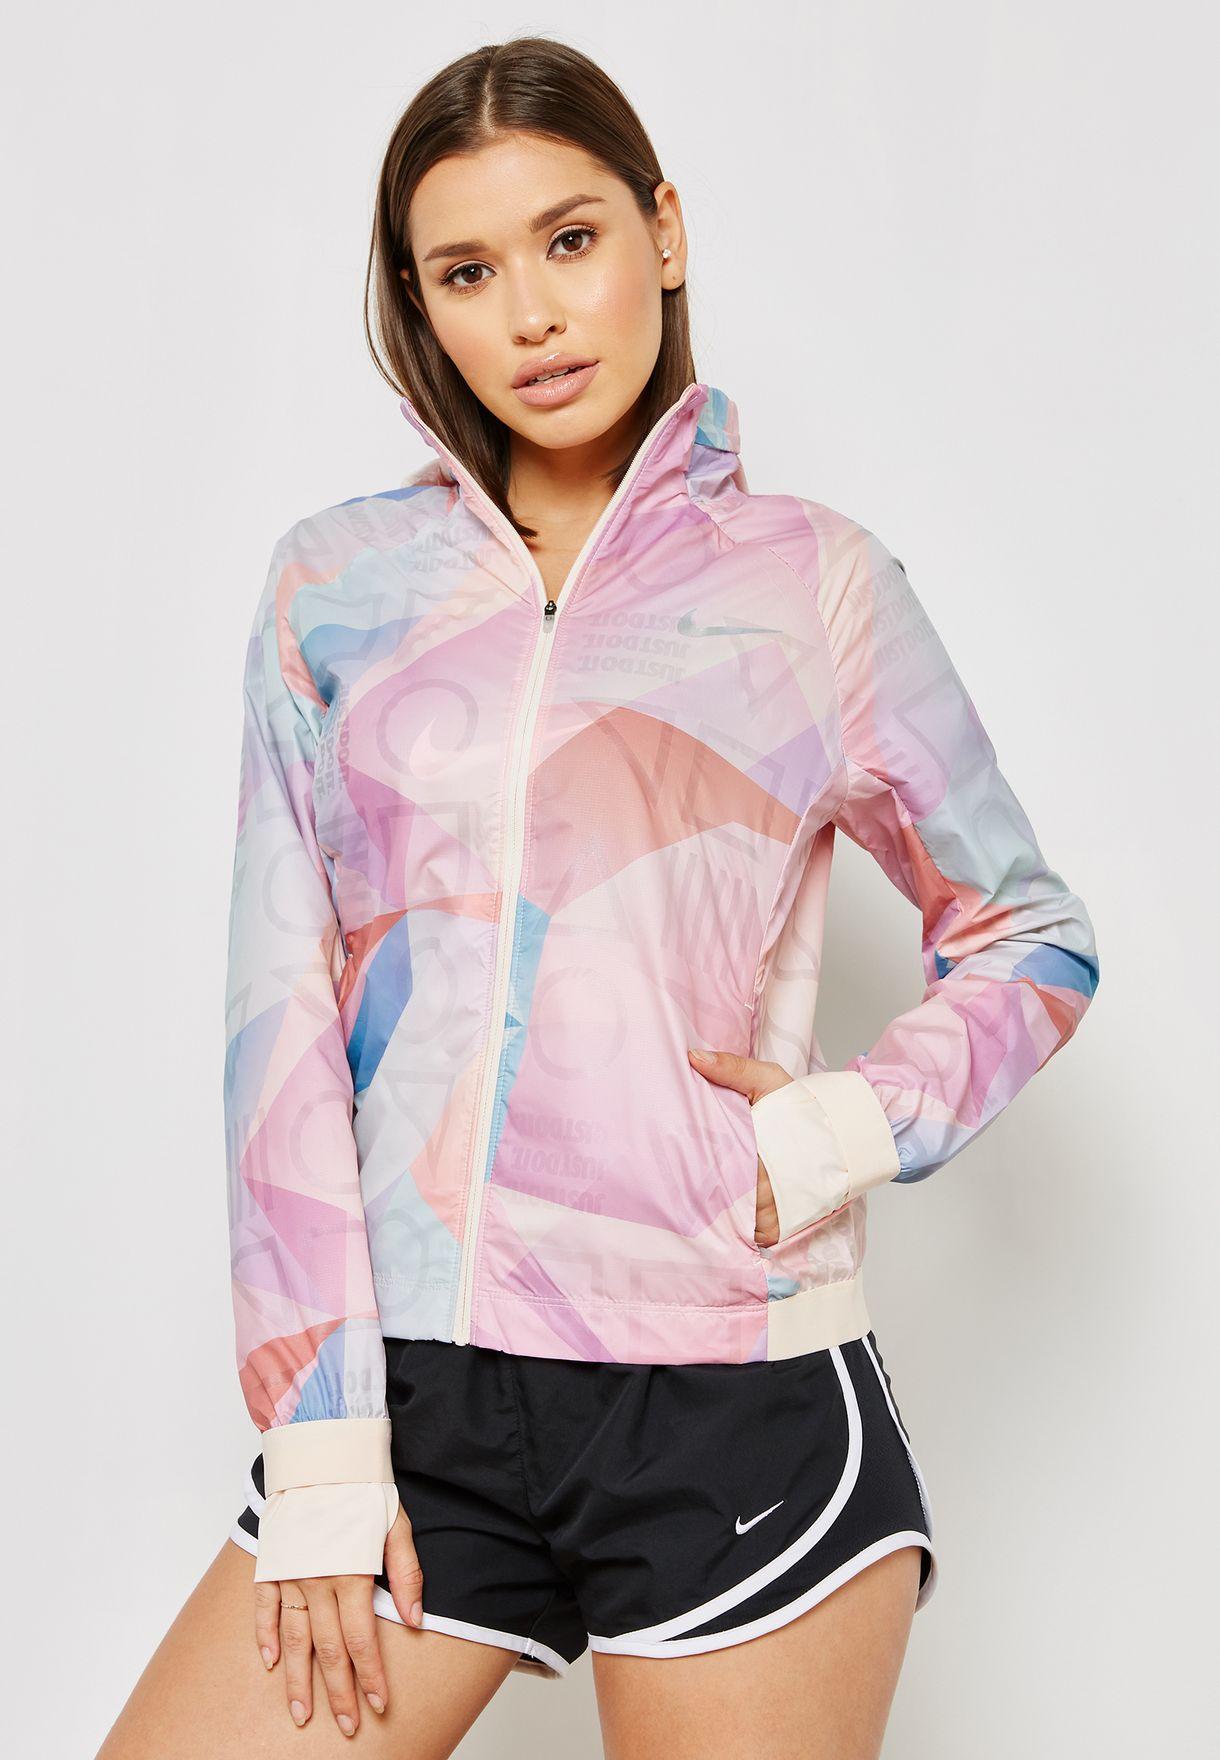 Shield Hooded Jacket